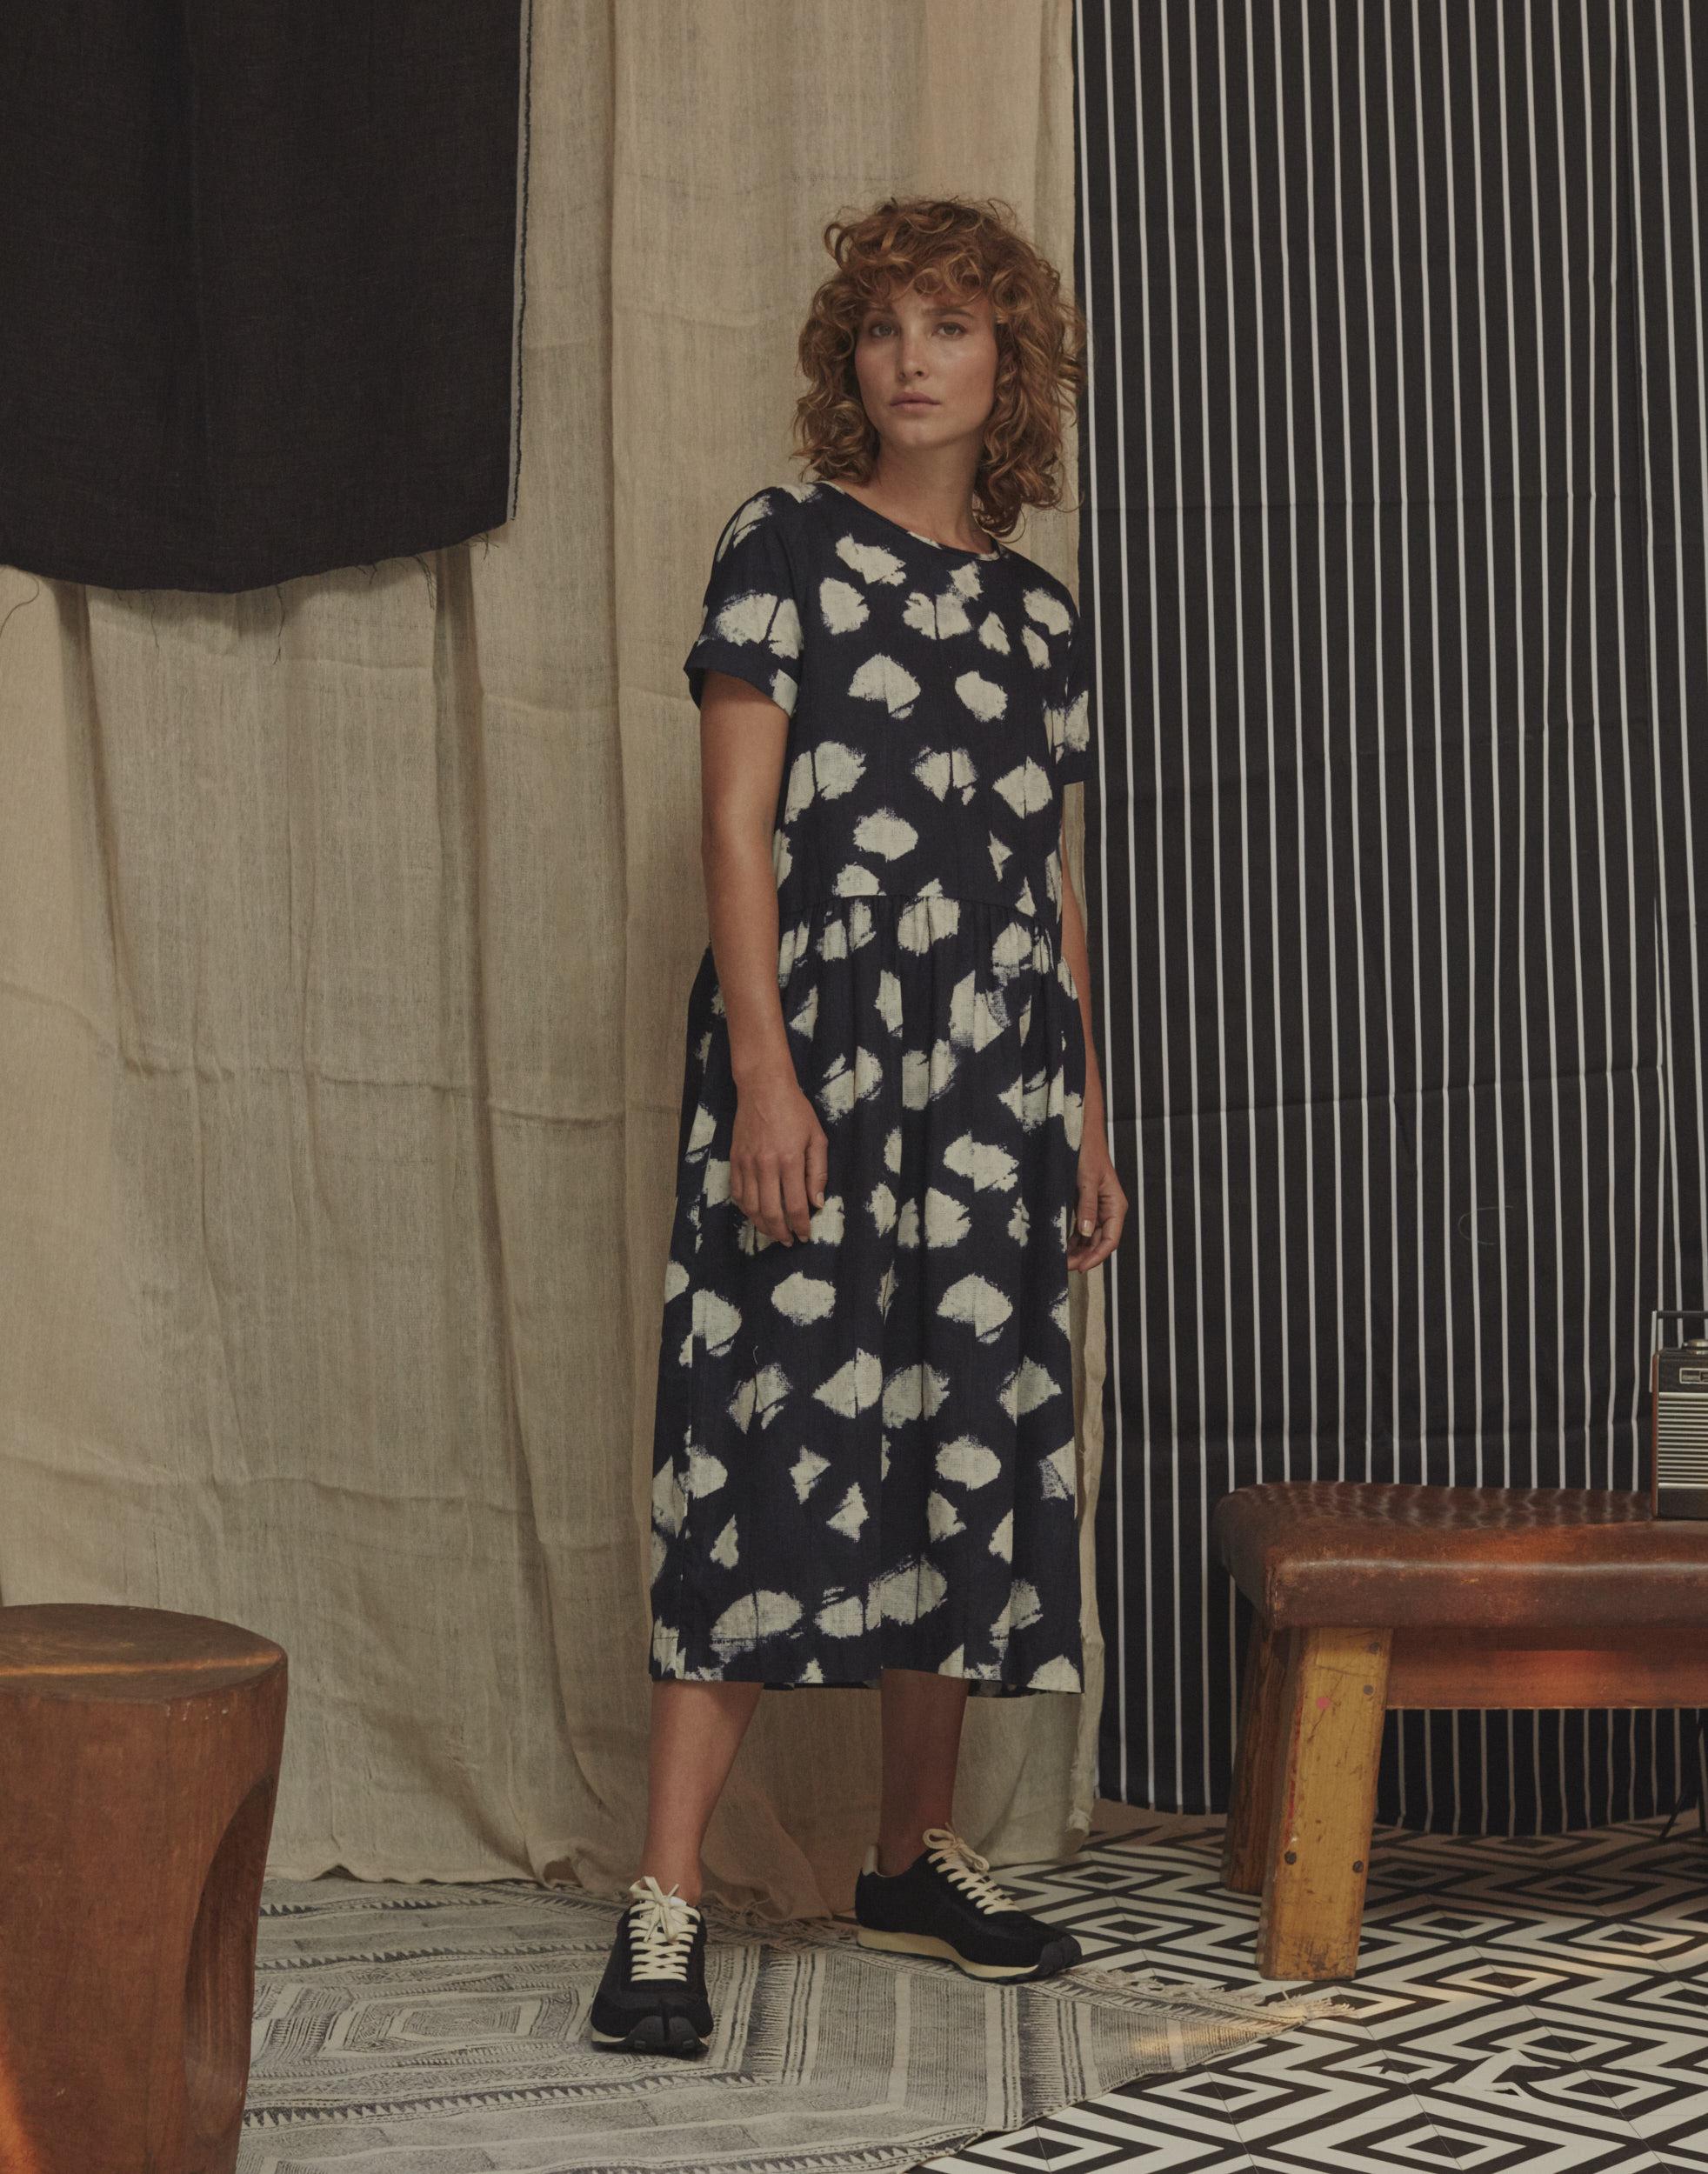 ymc-ss17-collection-okoro-women-fashion-folkr-1